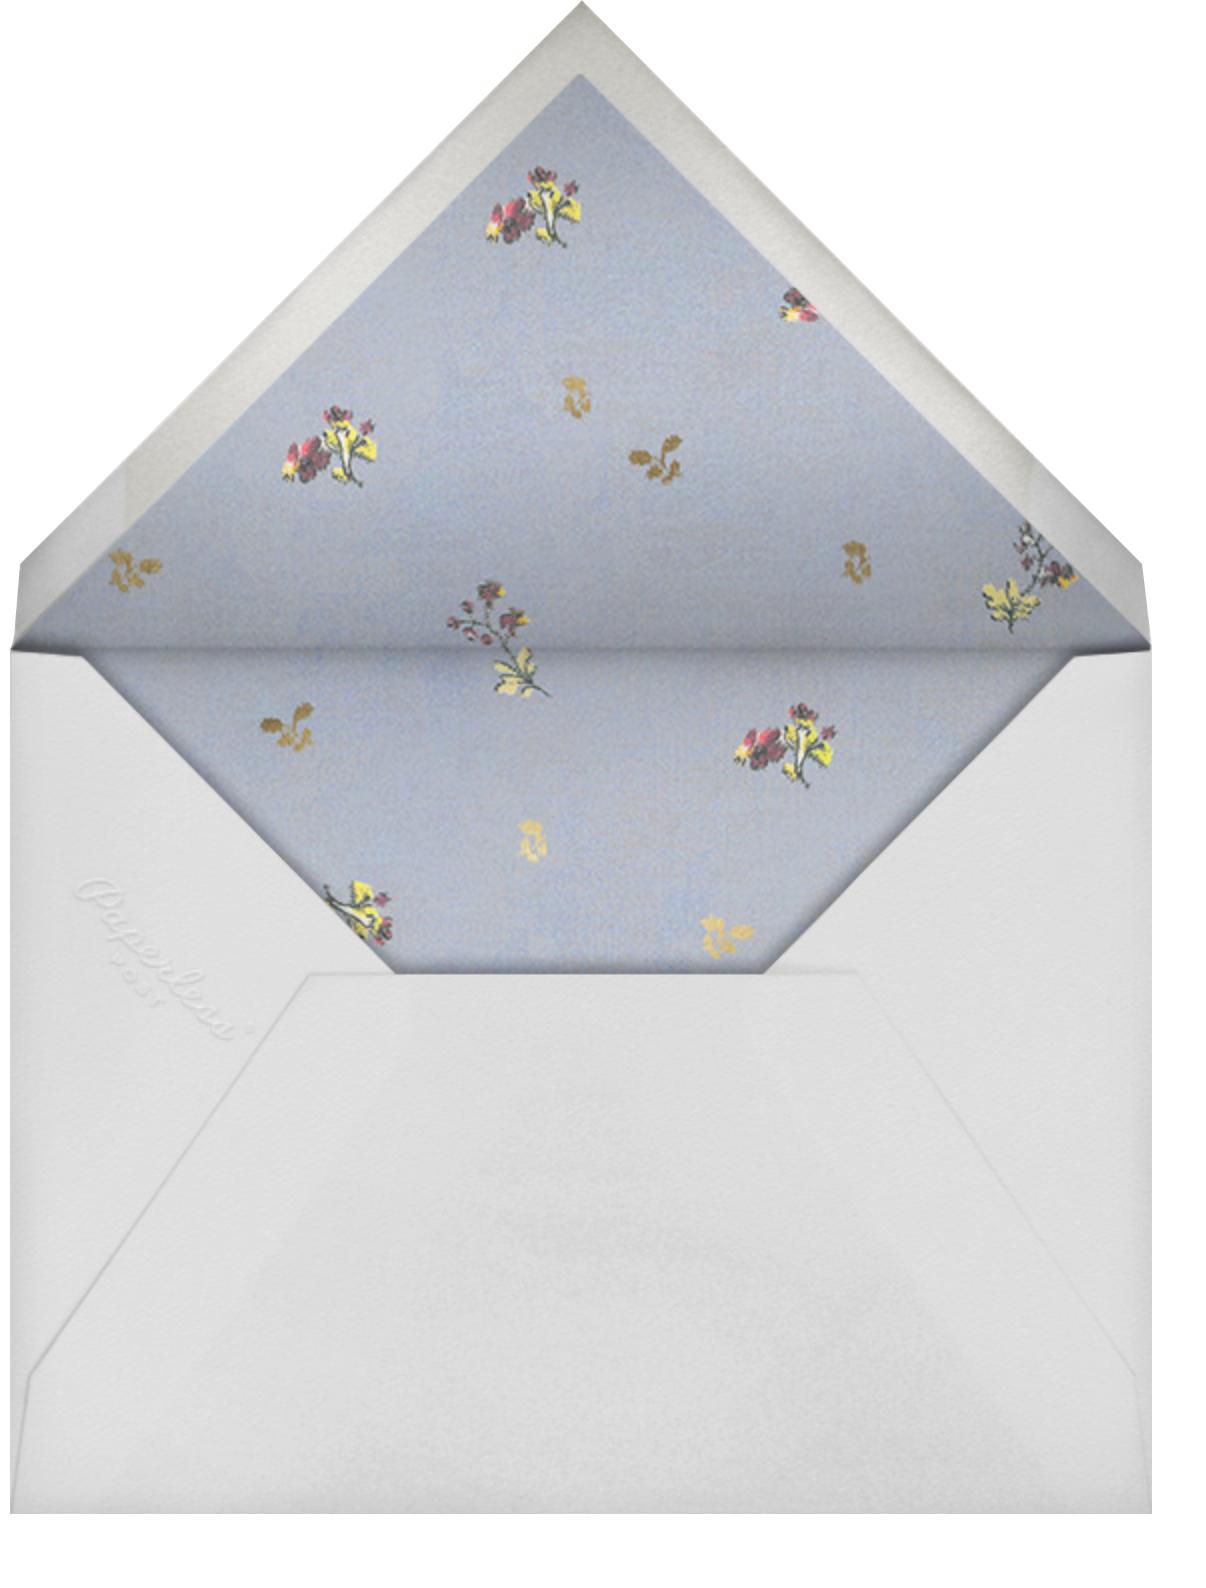 Poppea - Brock Collection - Baby shower - envelope back